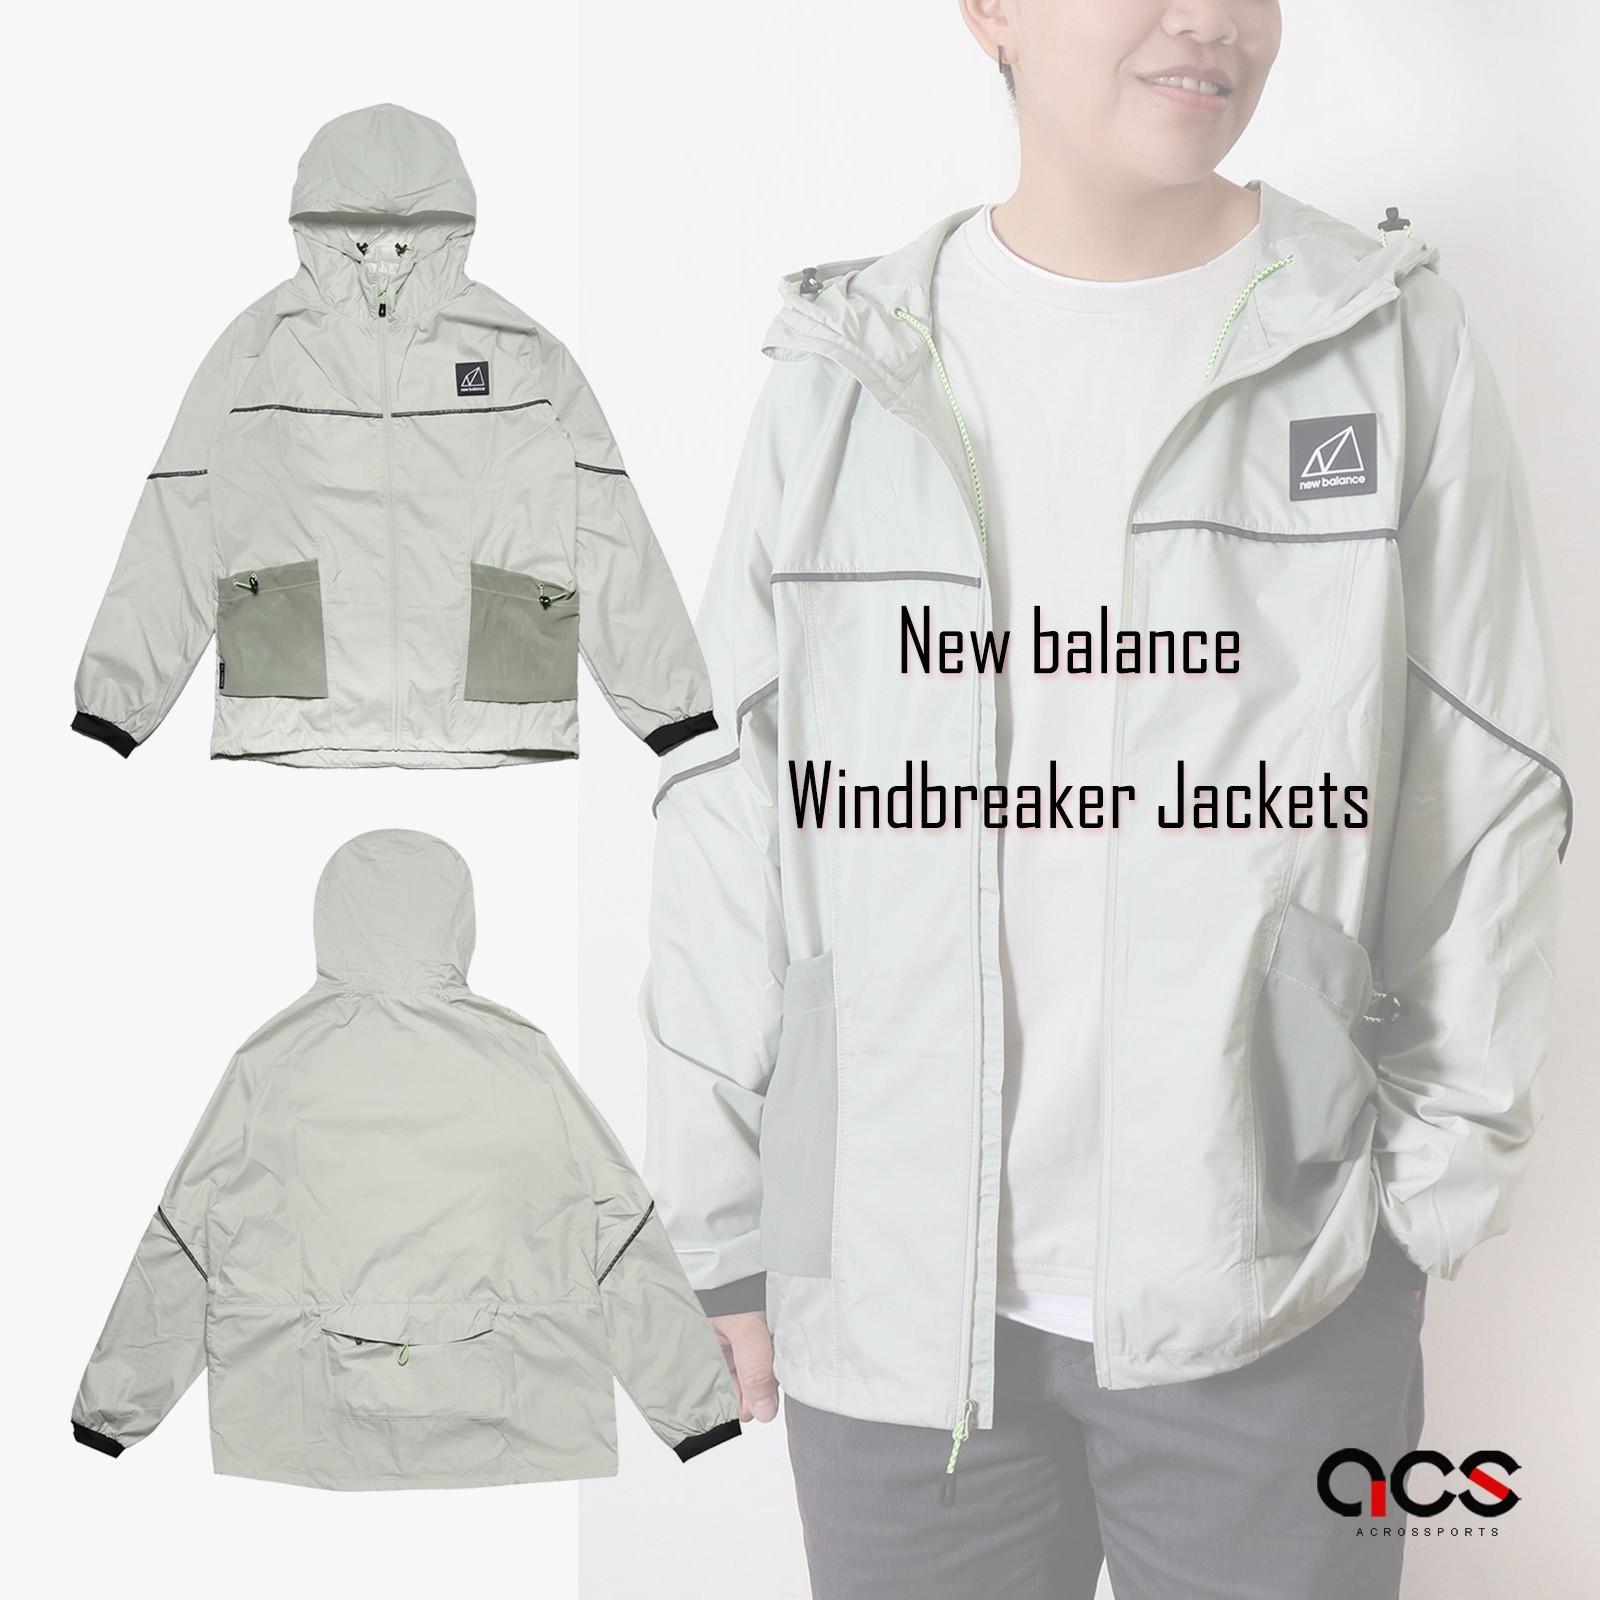 New balance 外套 Windbreaker Jackets 男女款 風衣【ACS】WJ11590SP4